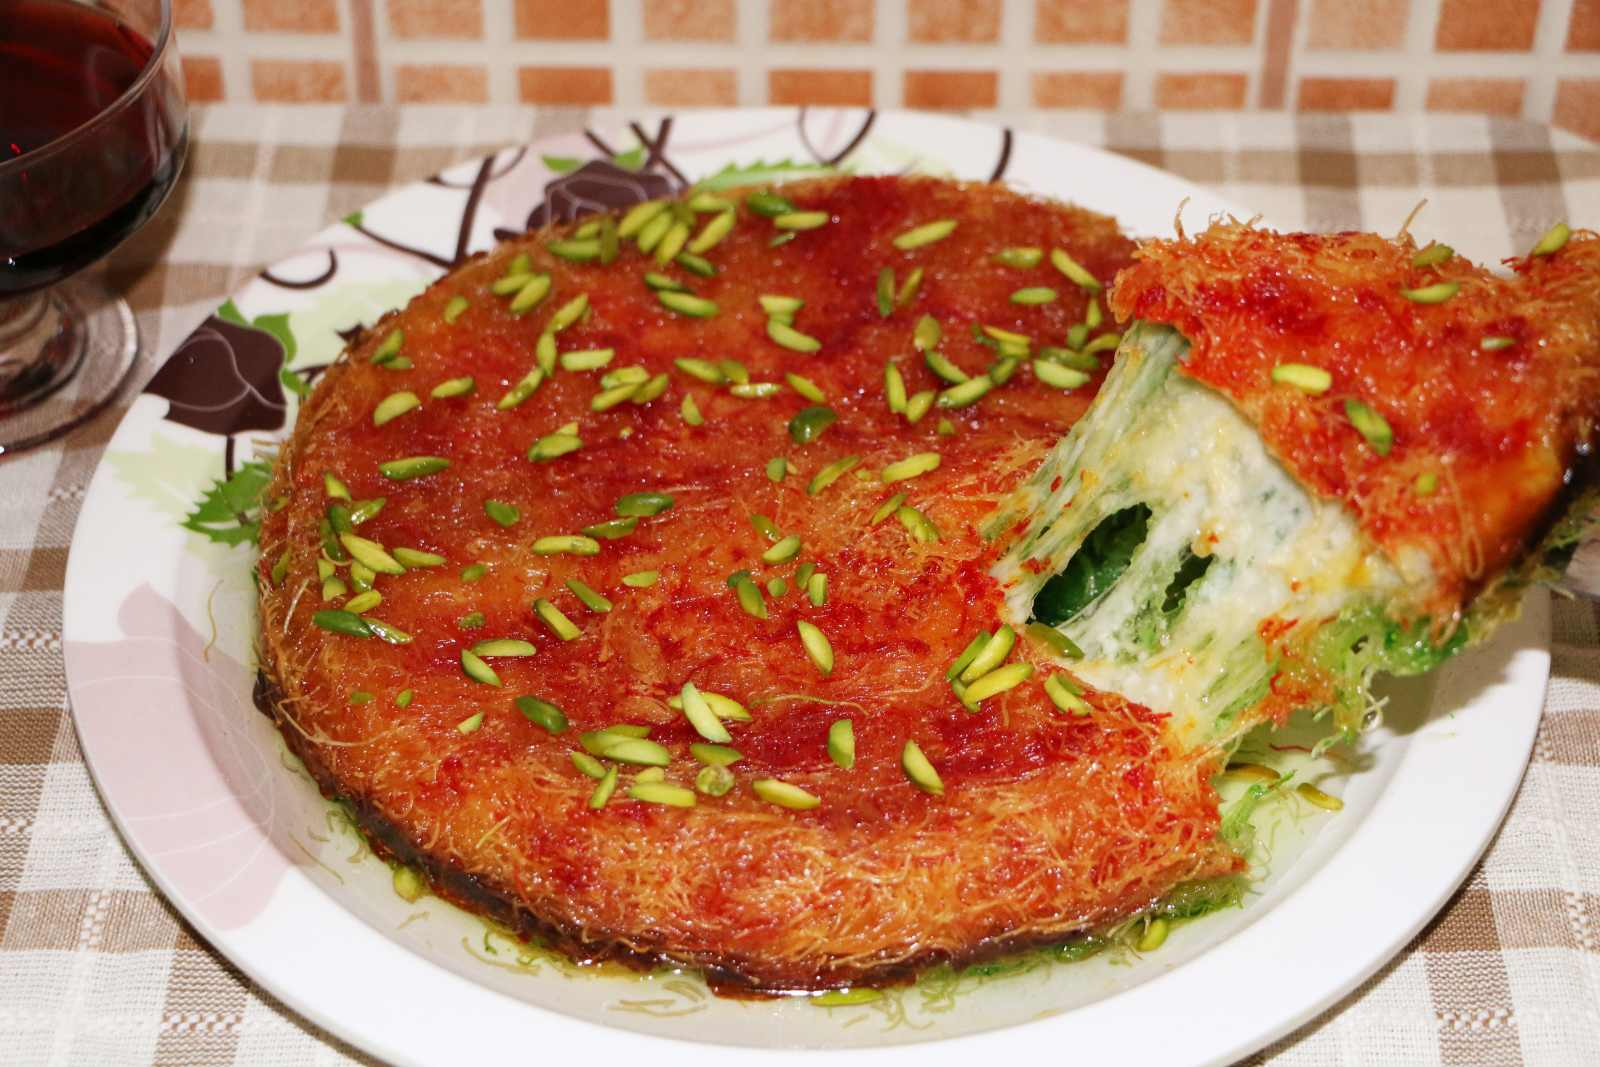 Delicious arabic sweet kunafa recipe knafeh by archanas kitchen delicious arabic sweet kunafa recipe knafeh forumfinder Images